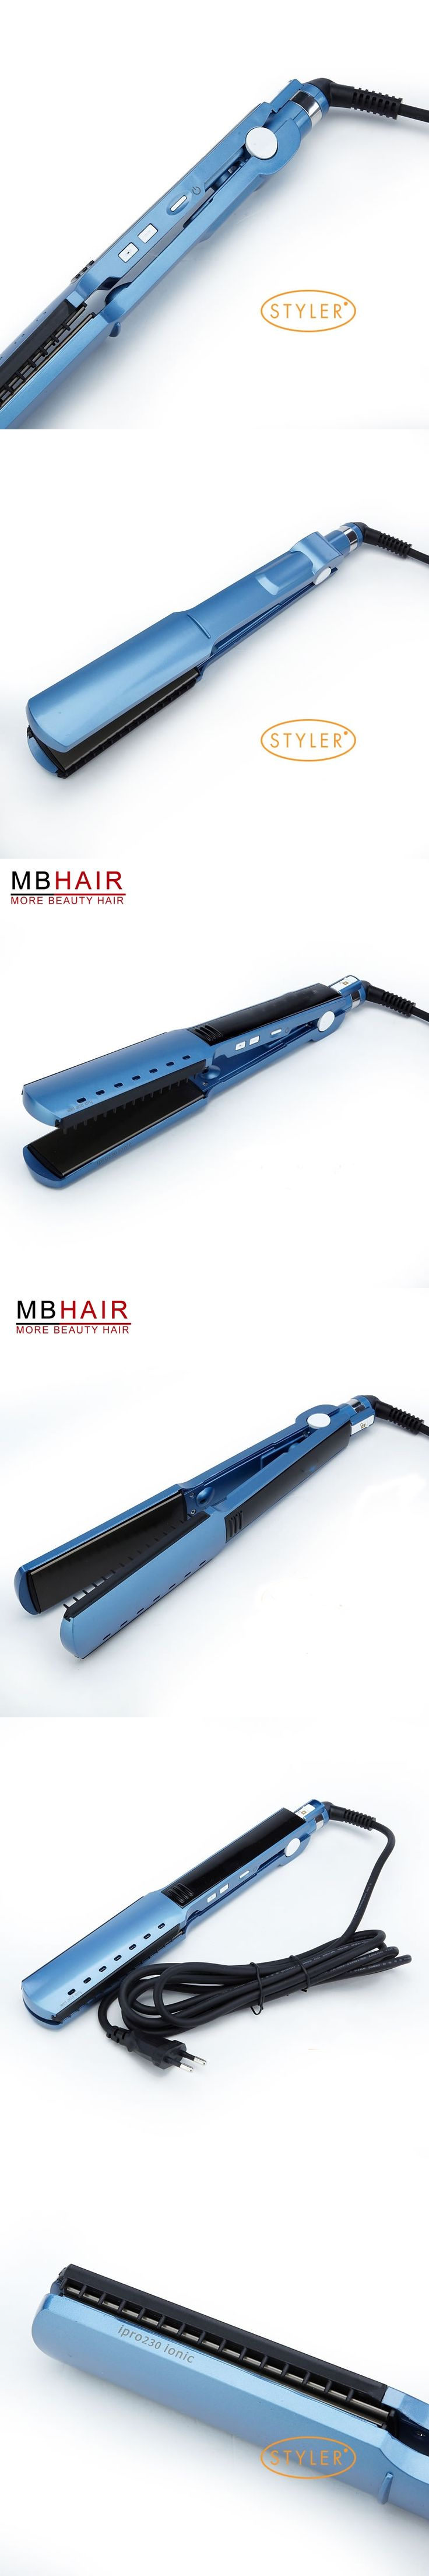 High quality professional Nano Titanium Hair Straightener Flat iron Iron adjust temperature wet and dry Fast Heat Not hurt hair